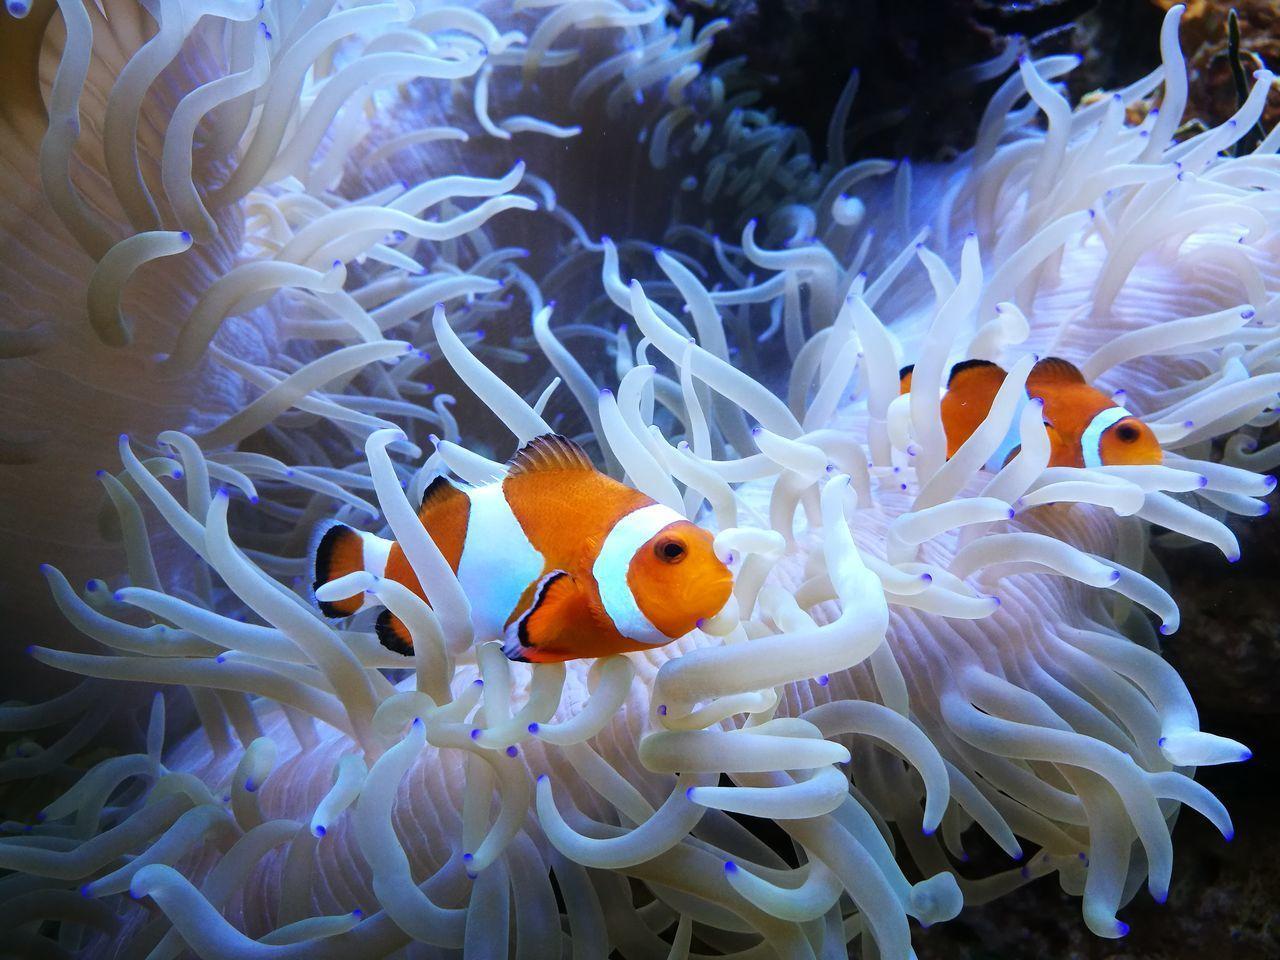 animal, animal themes, animal wildlife, animals in the wild, water, fish, underwater, clown fish, sea life, sea, swimming, no people, coral, undersea, marine, vertebrate, invertebrate, beauty in nature, orange color